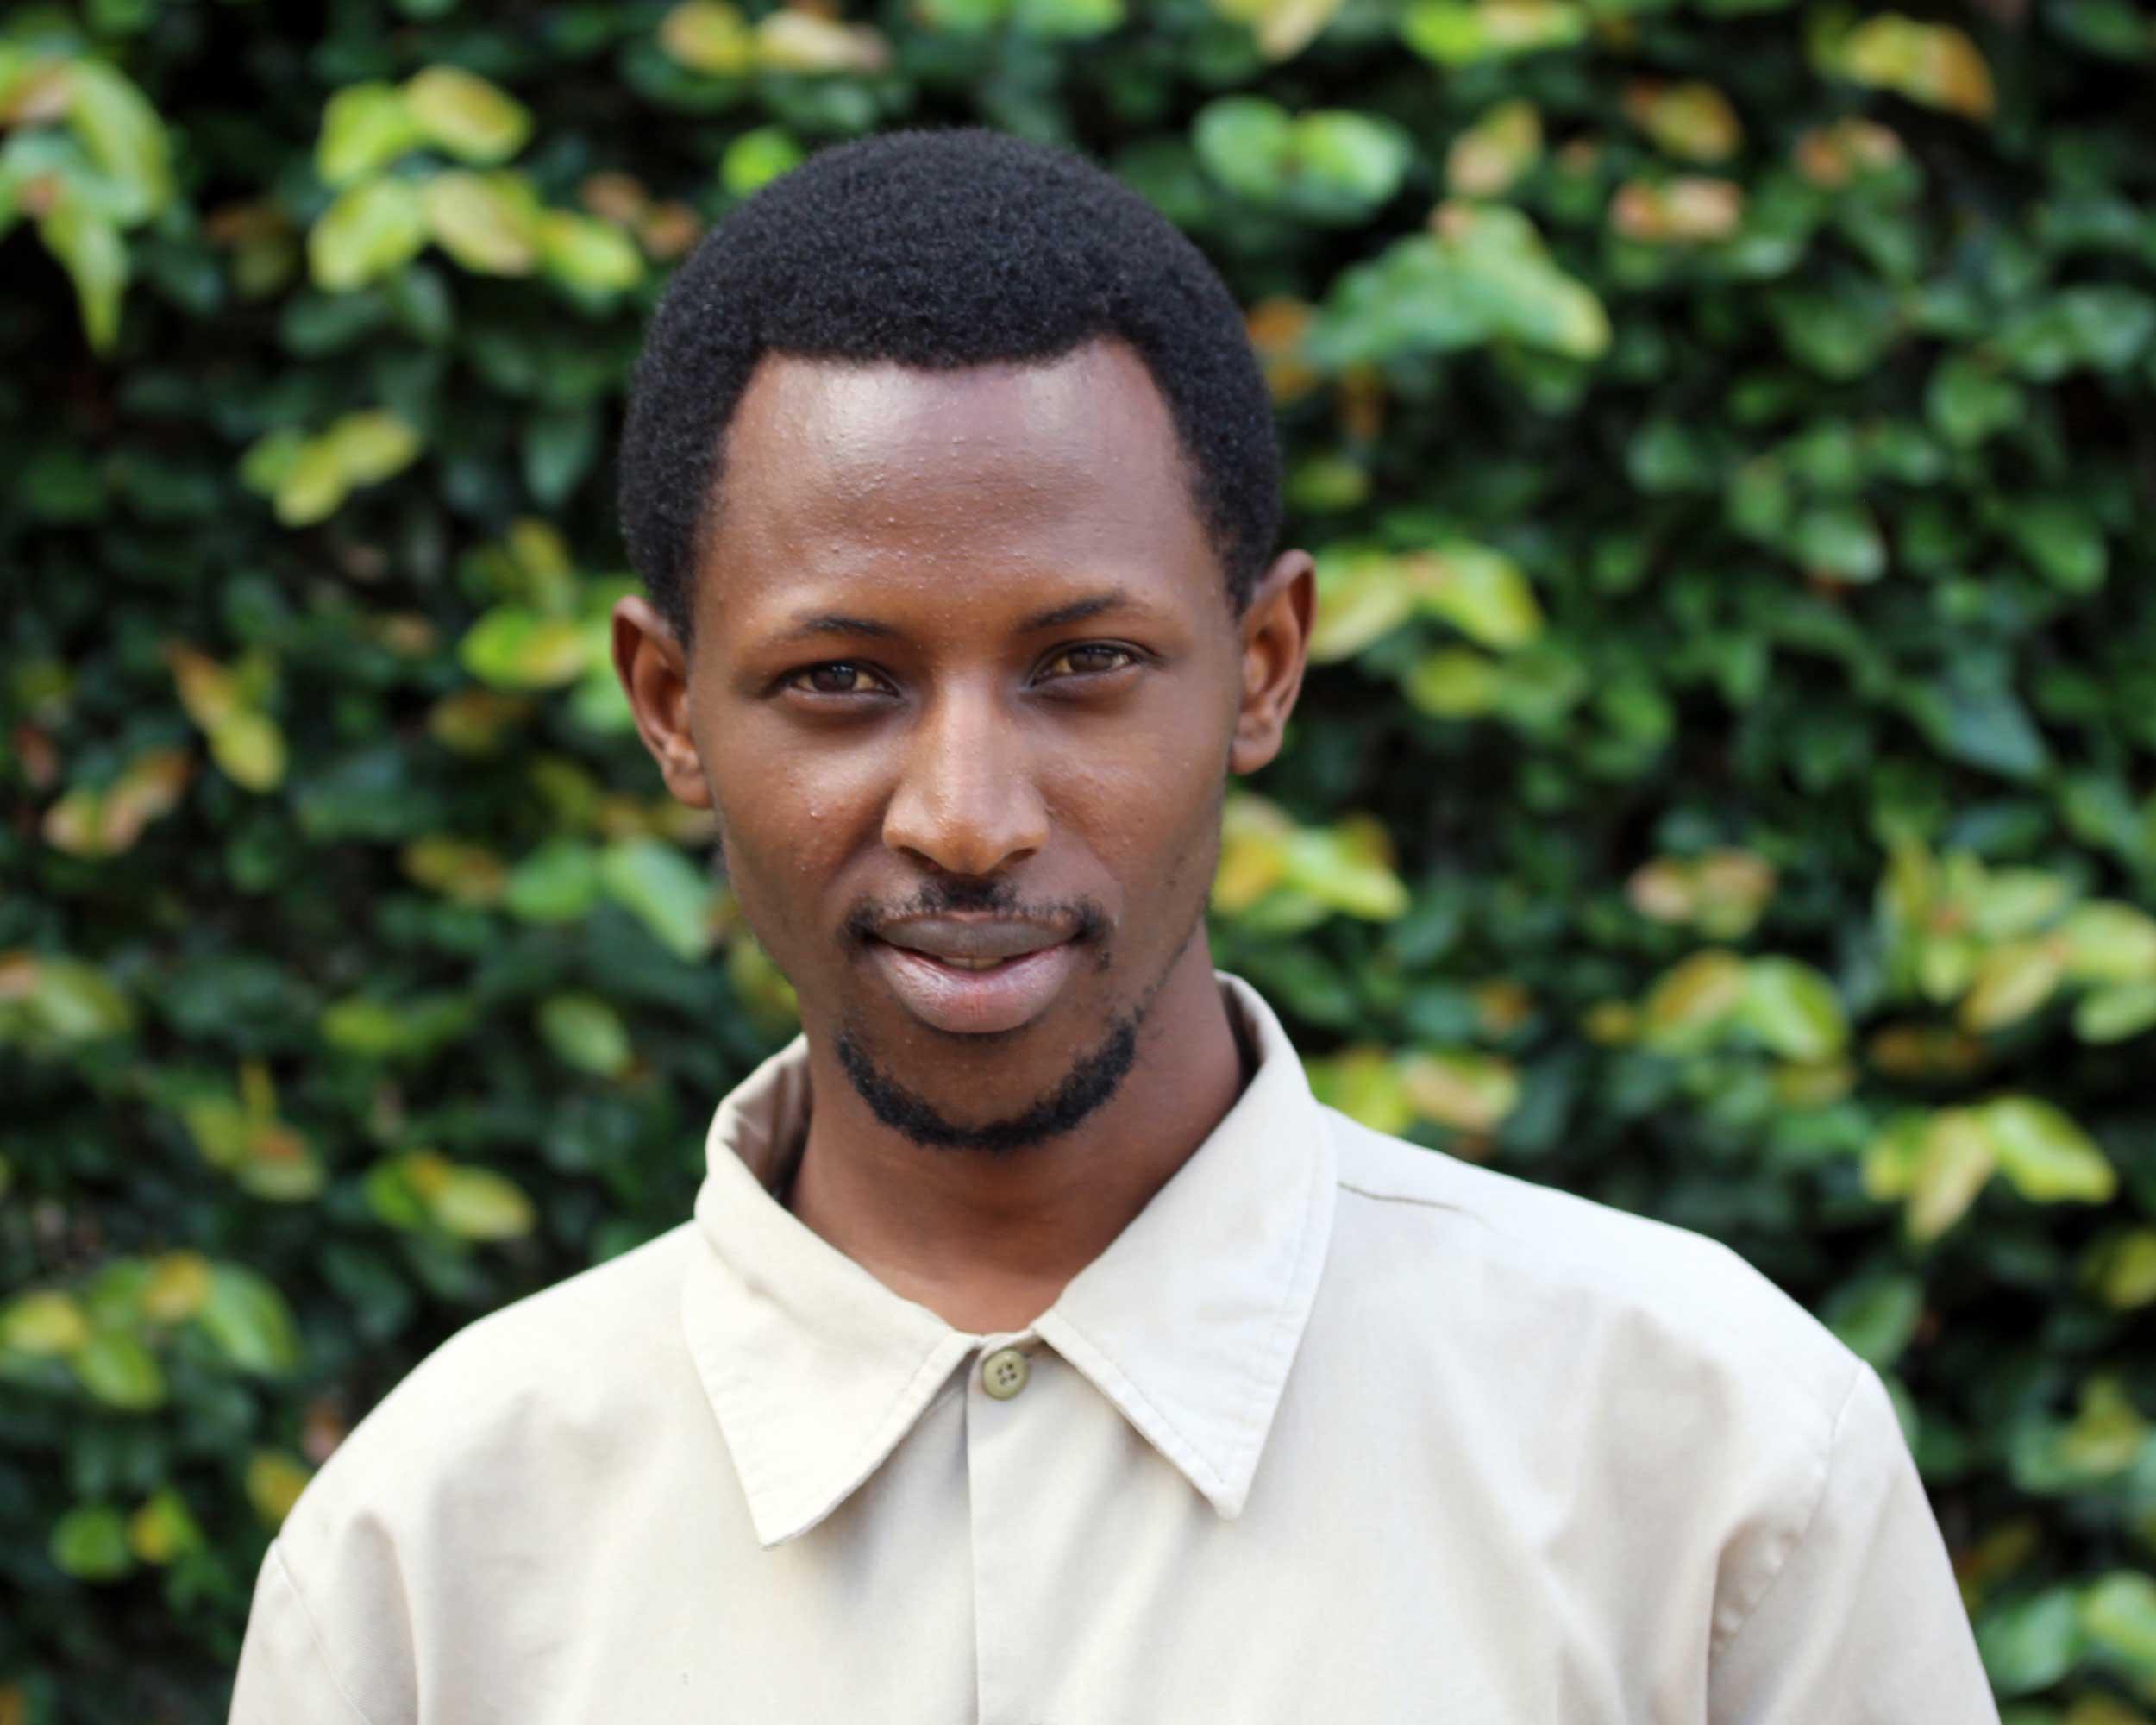 Emmanuel Munyankuge